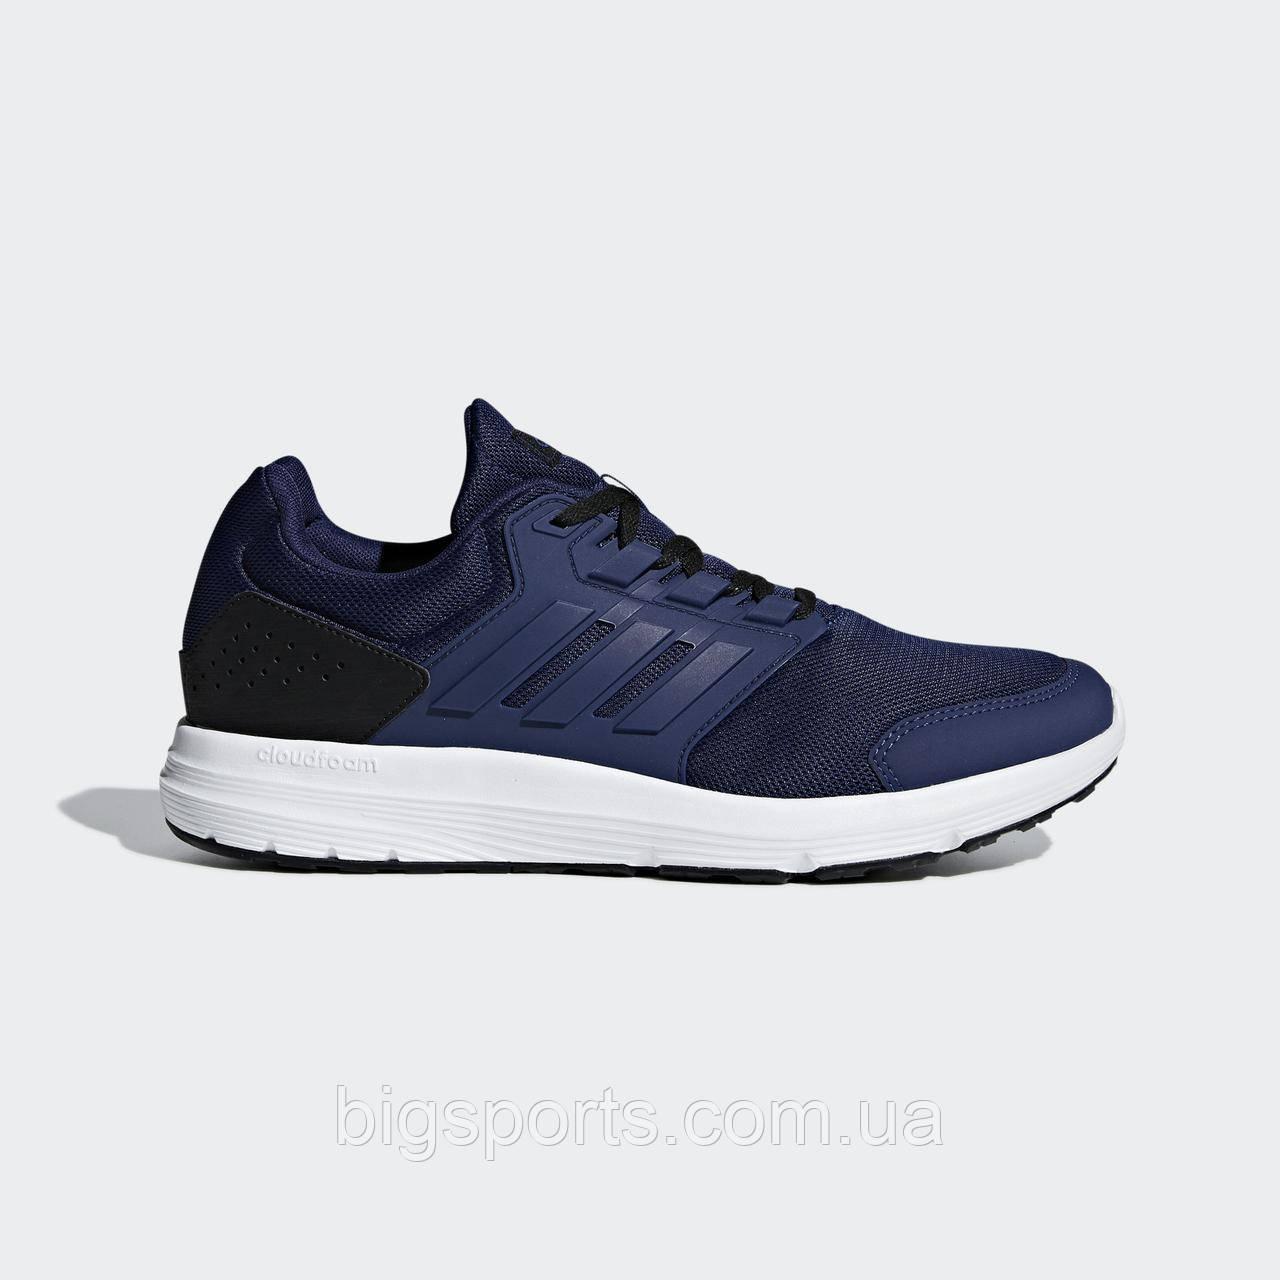 Кроссовки муж. Adidas Galaxy 4 (арт. F36159)